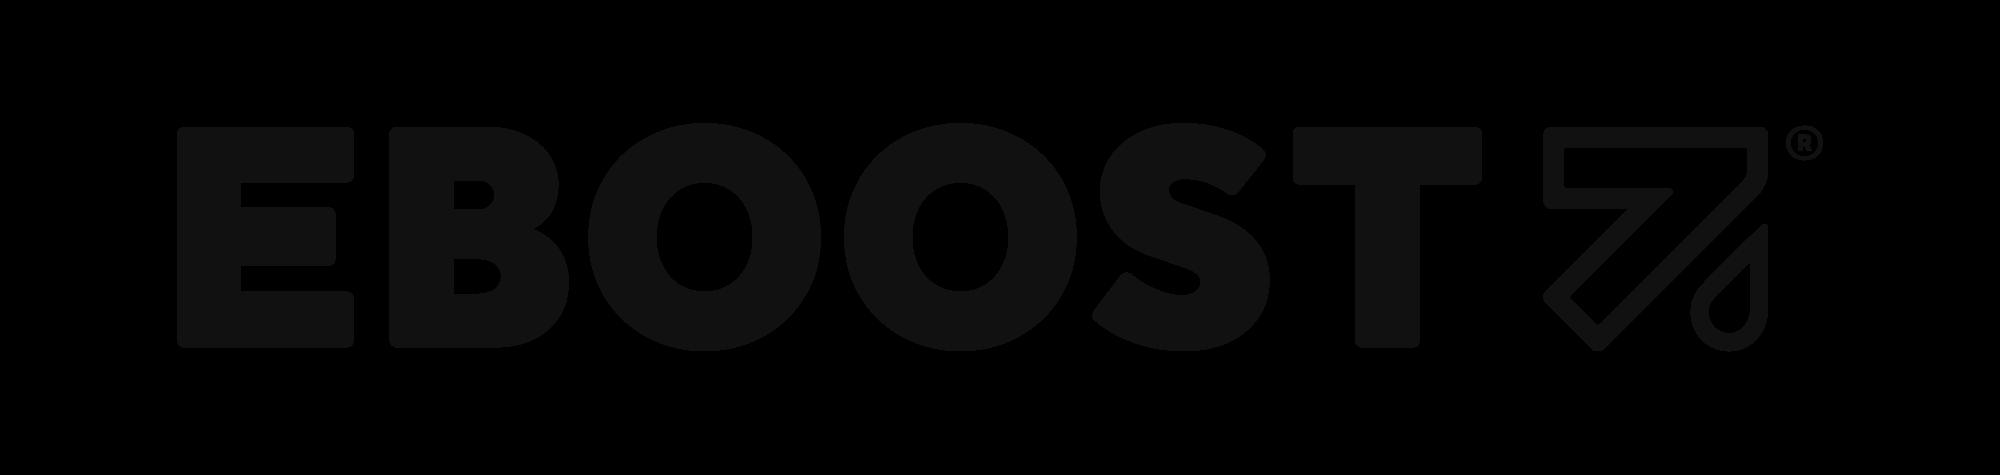 EBOOST Home